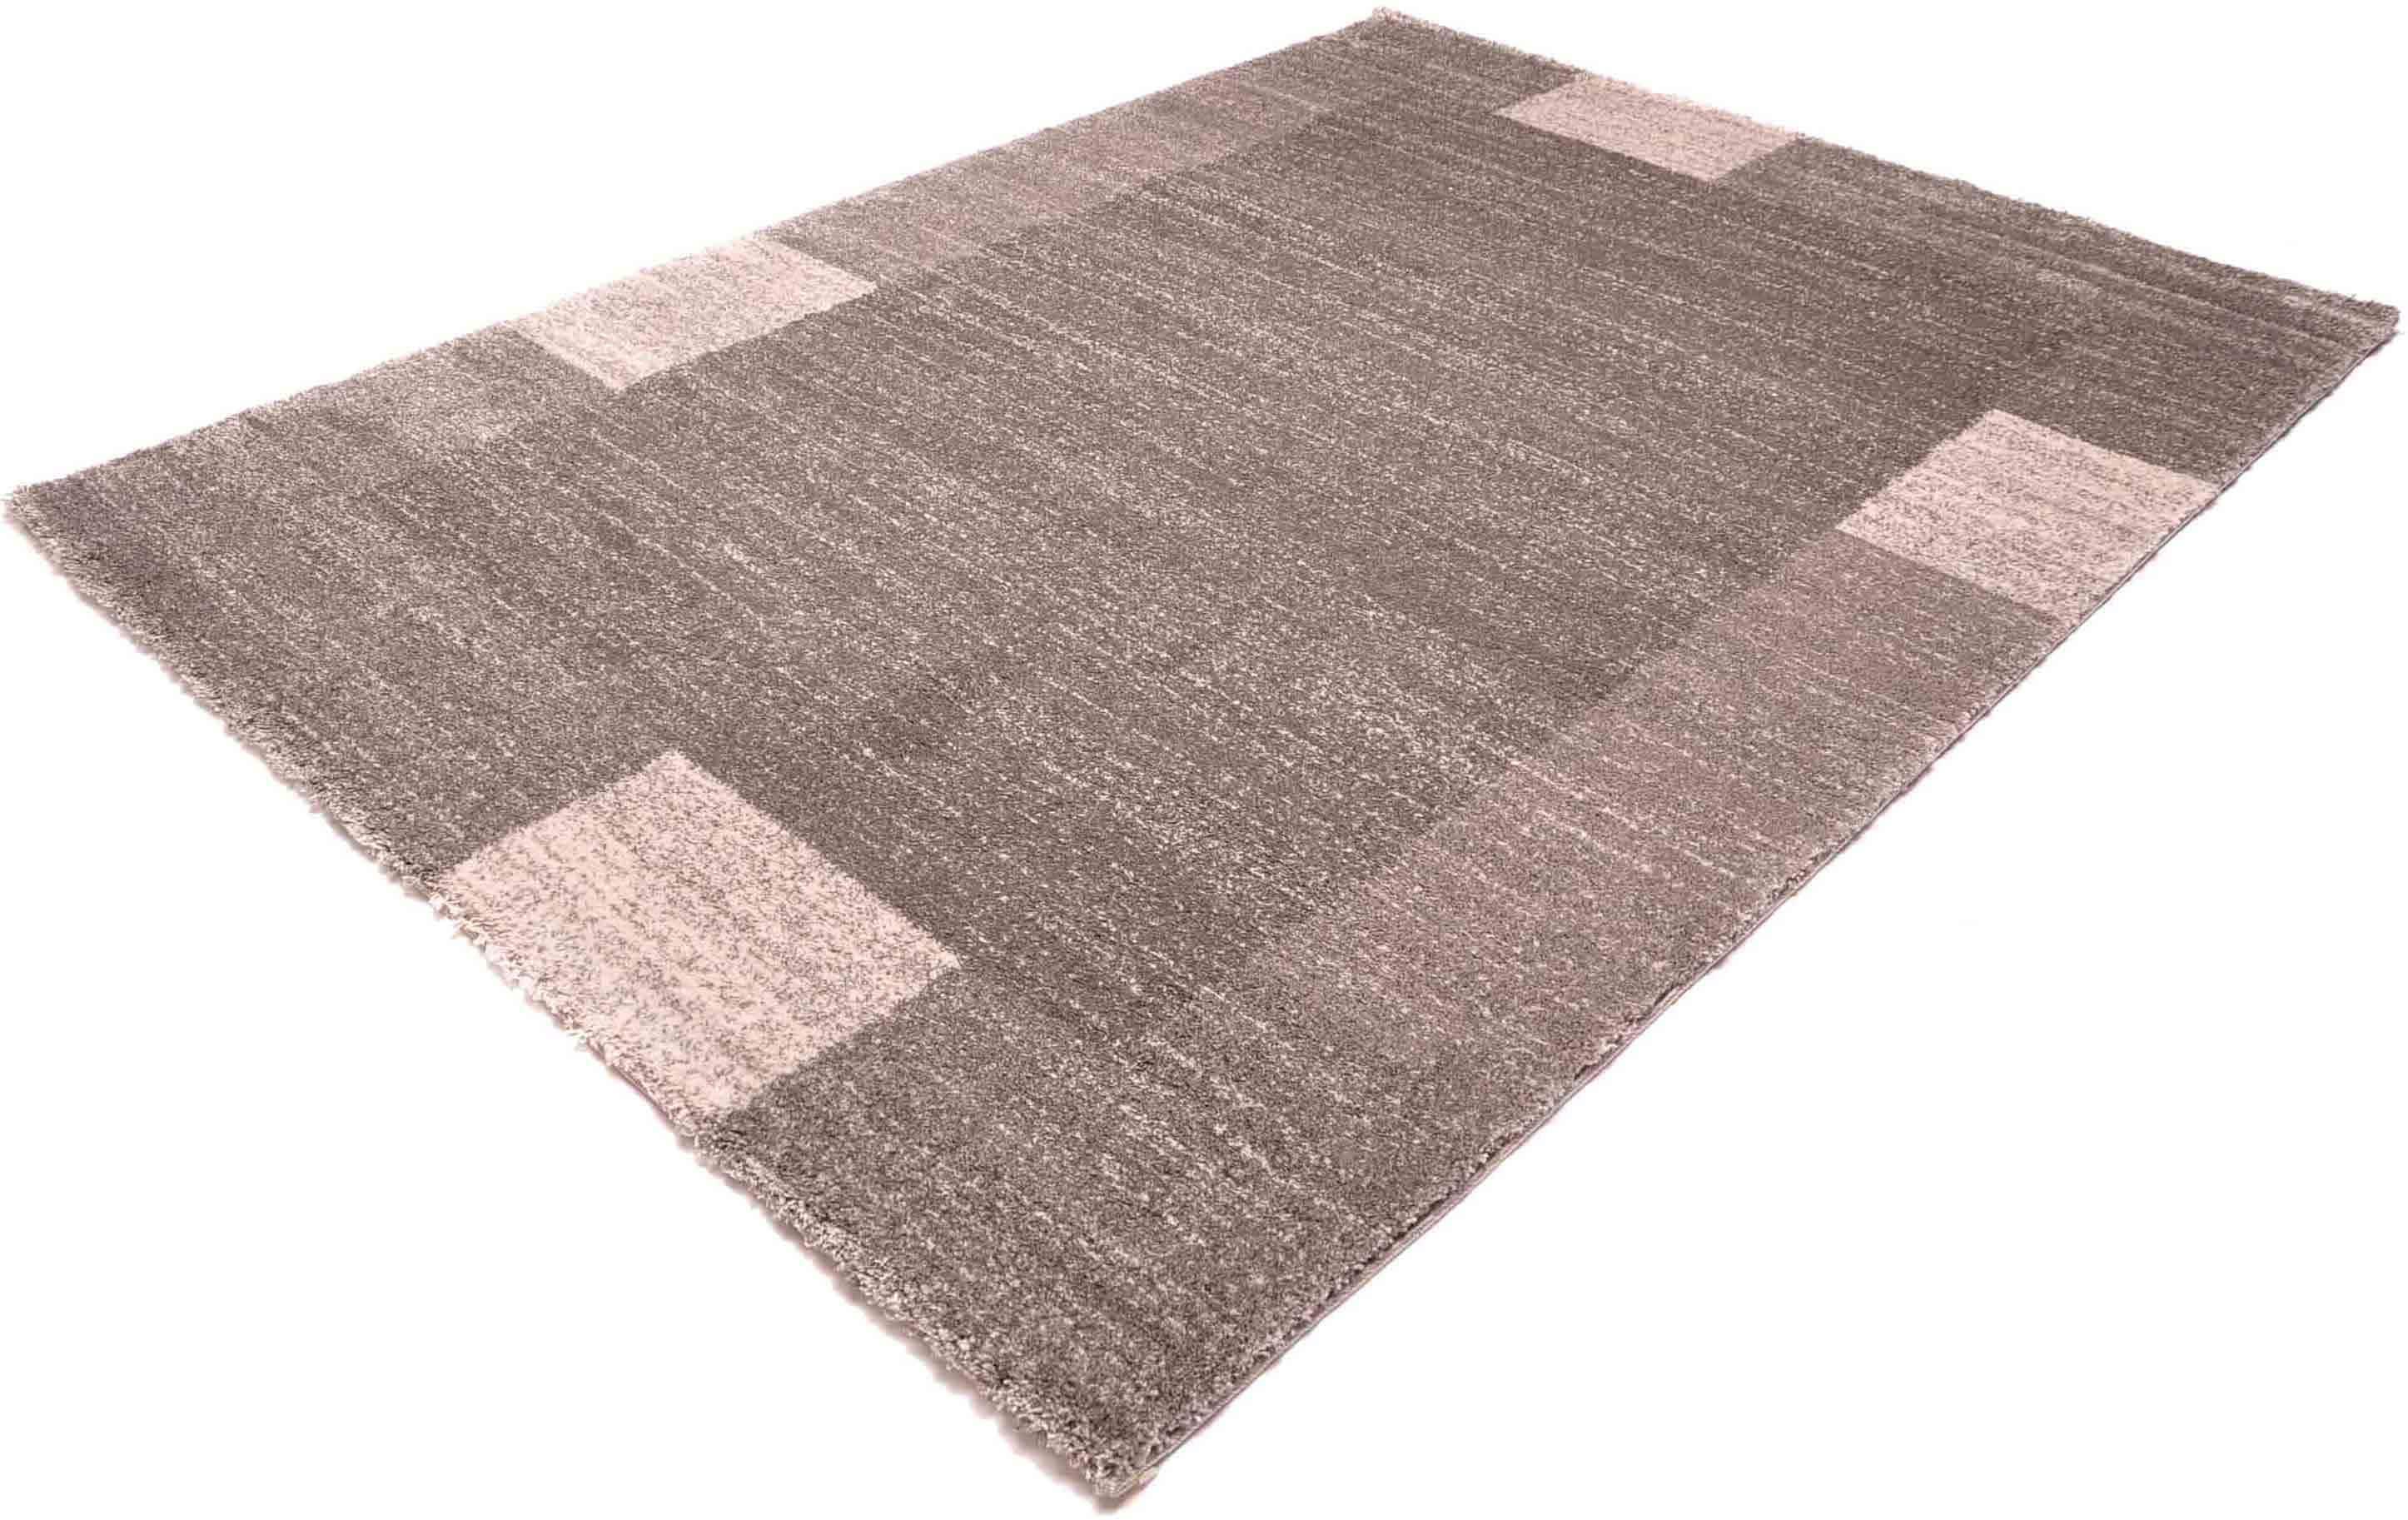 Teppich Gabeh 1106 Böing Carpet rechteckig Höhe 20 mm maschinell zusammengesetzt